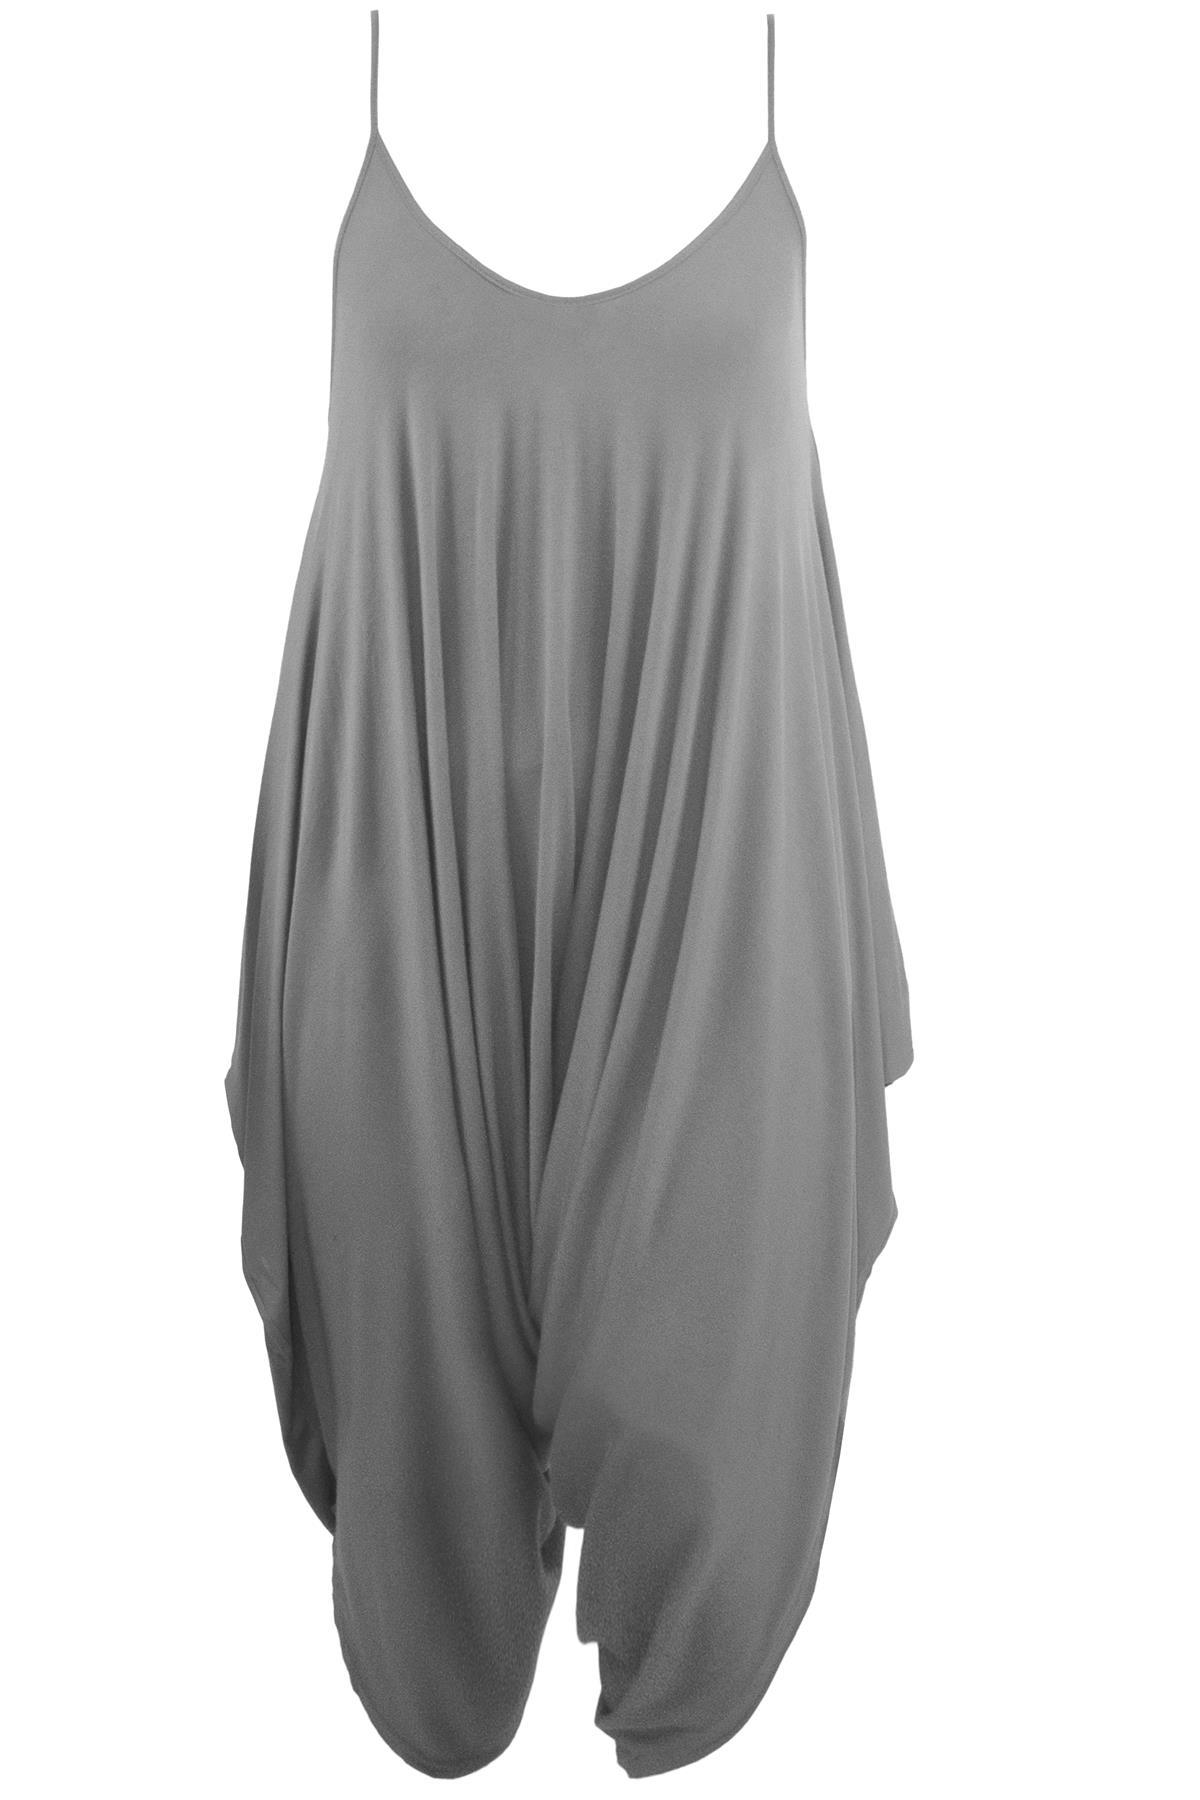 Plus Size Ladies Womens Strappy Lagenlook Romper Baggy Harem Playsuit Jumpsuit